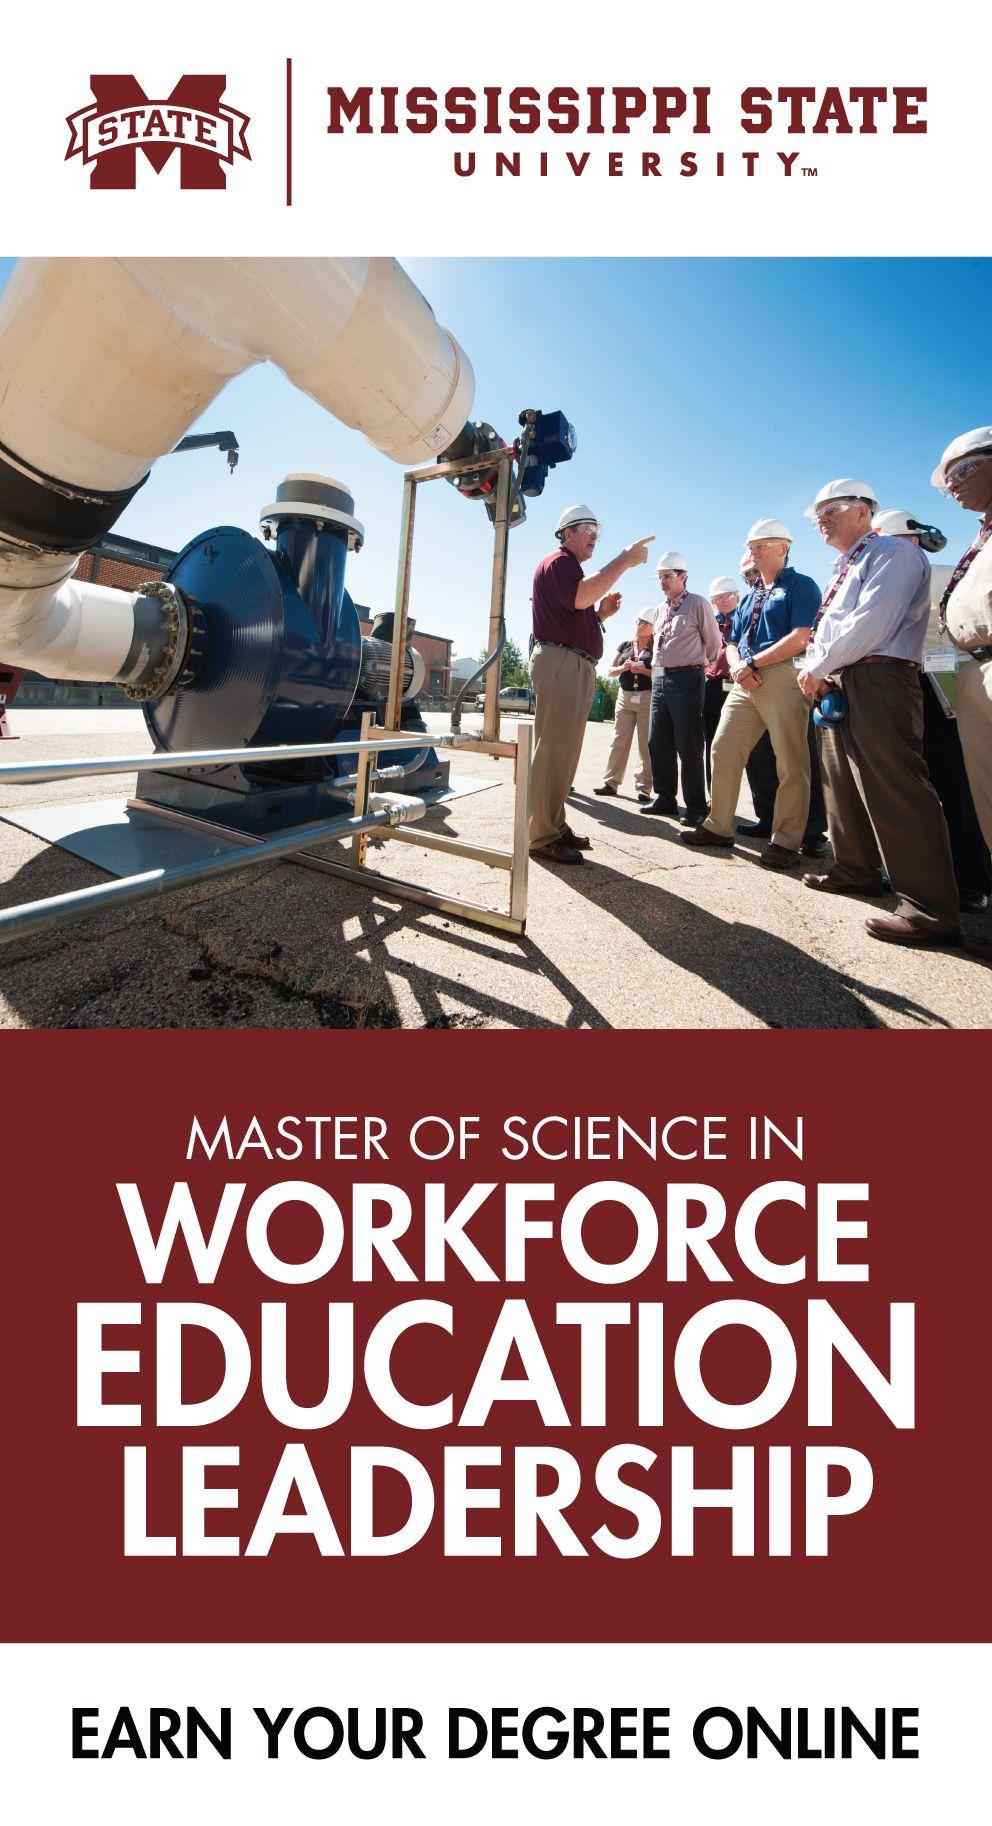 The Master of Science in Workforce Education Leadership